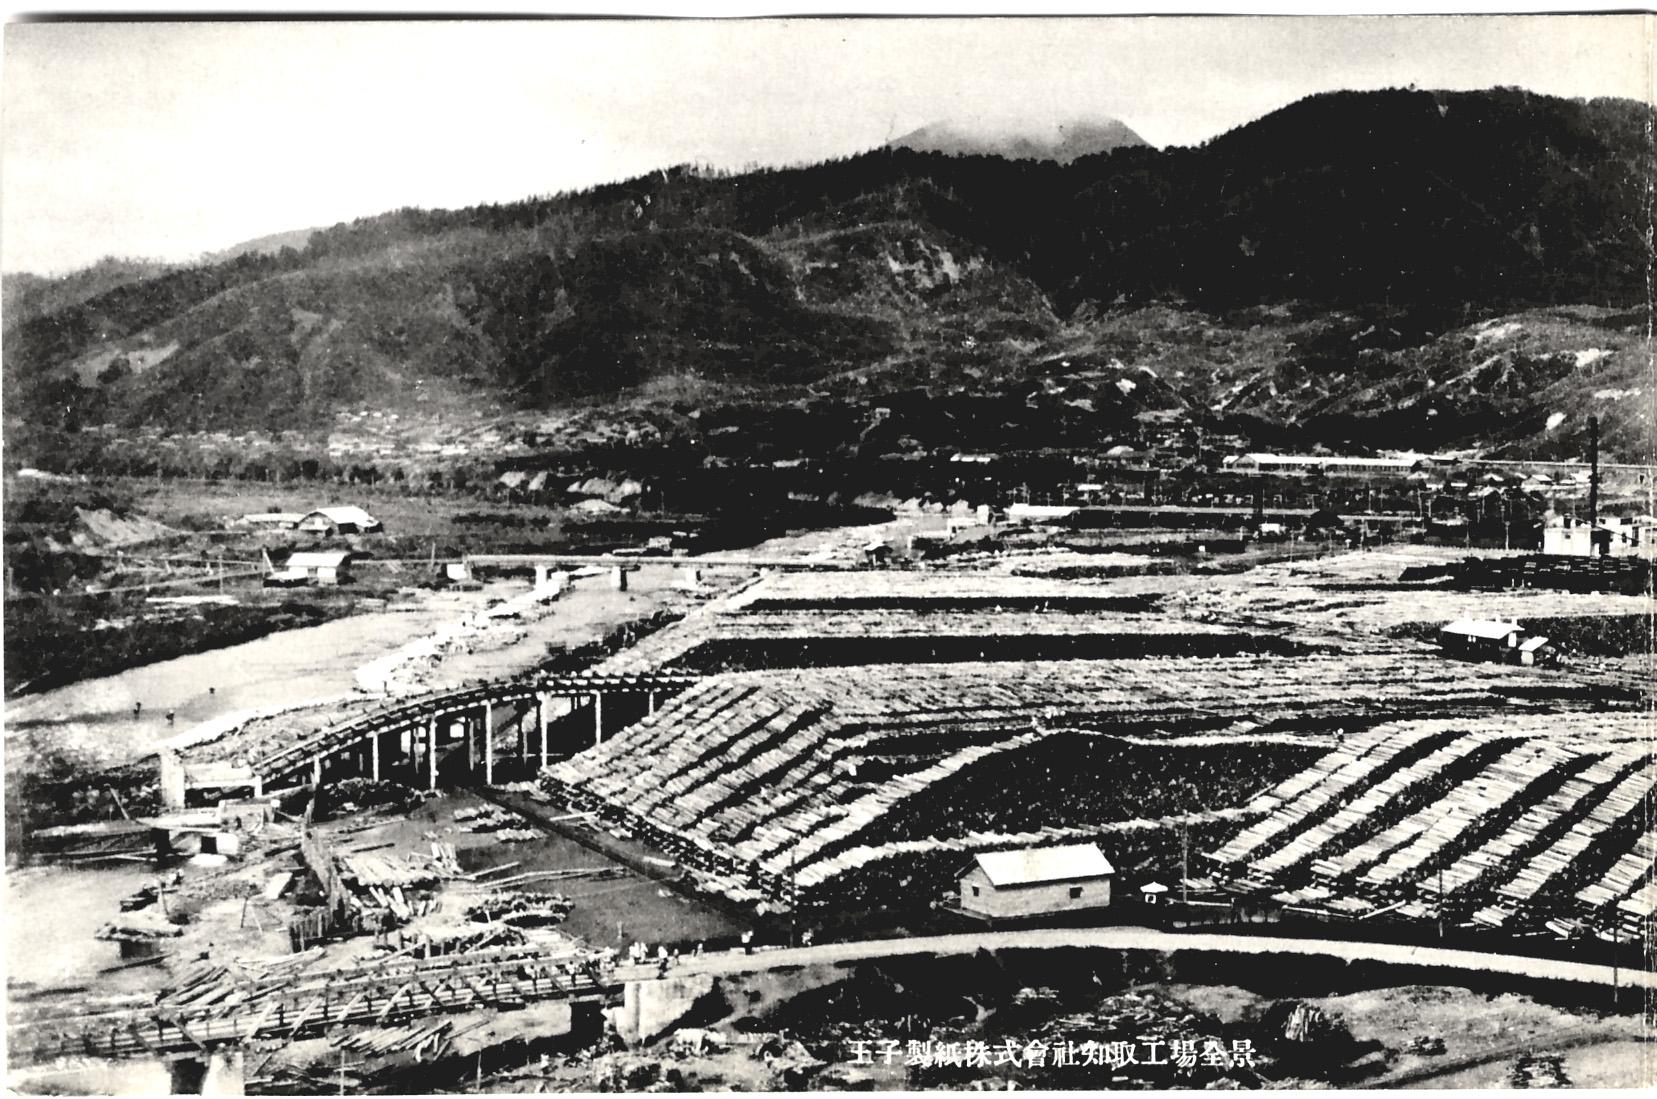 Целлюлозно-бумажная фабрика Оджи в г. Сиритору